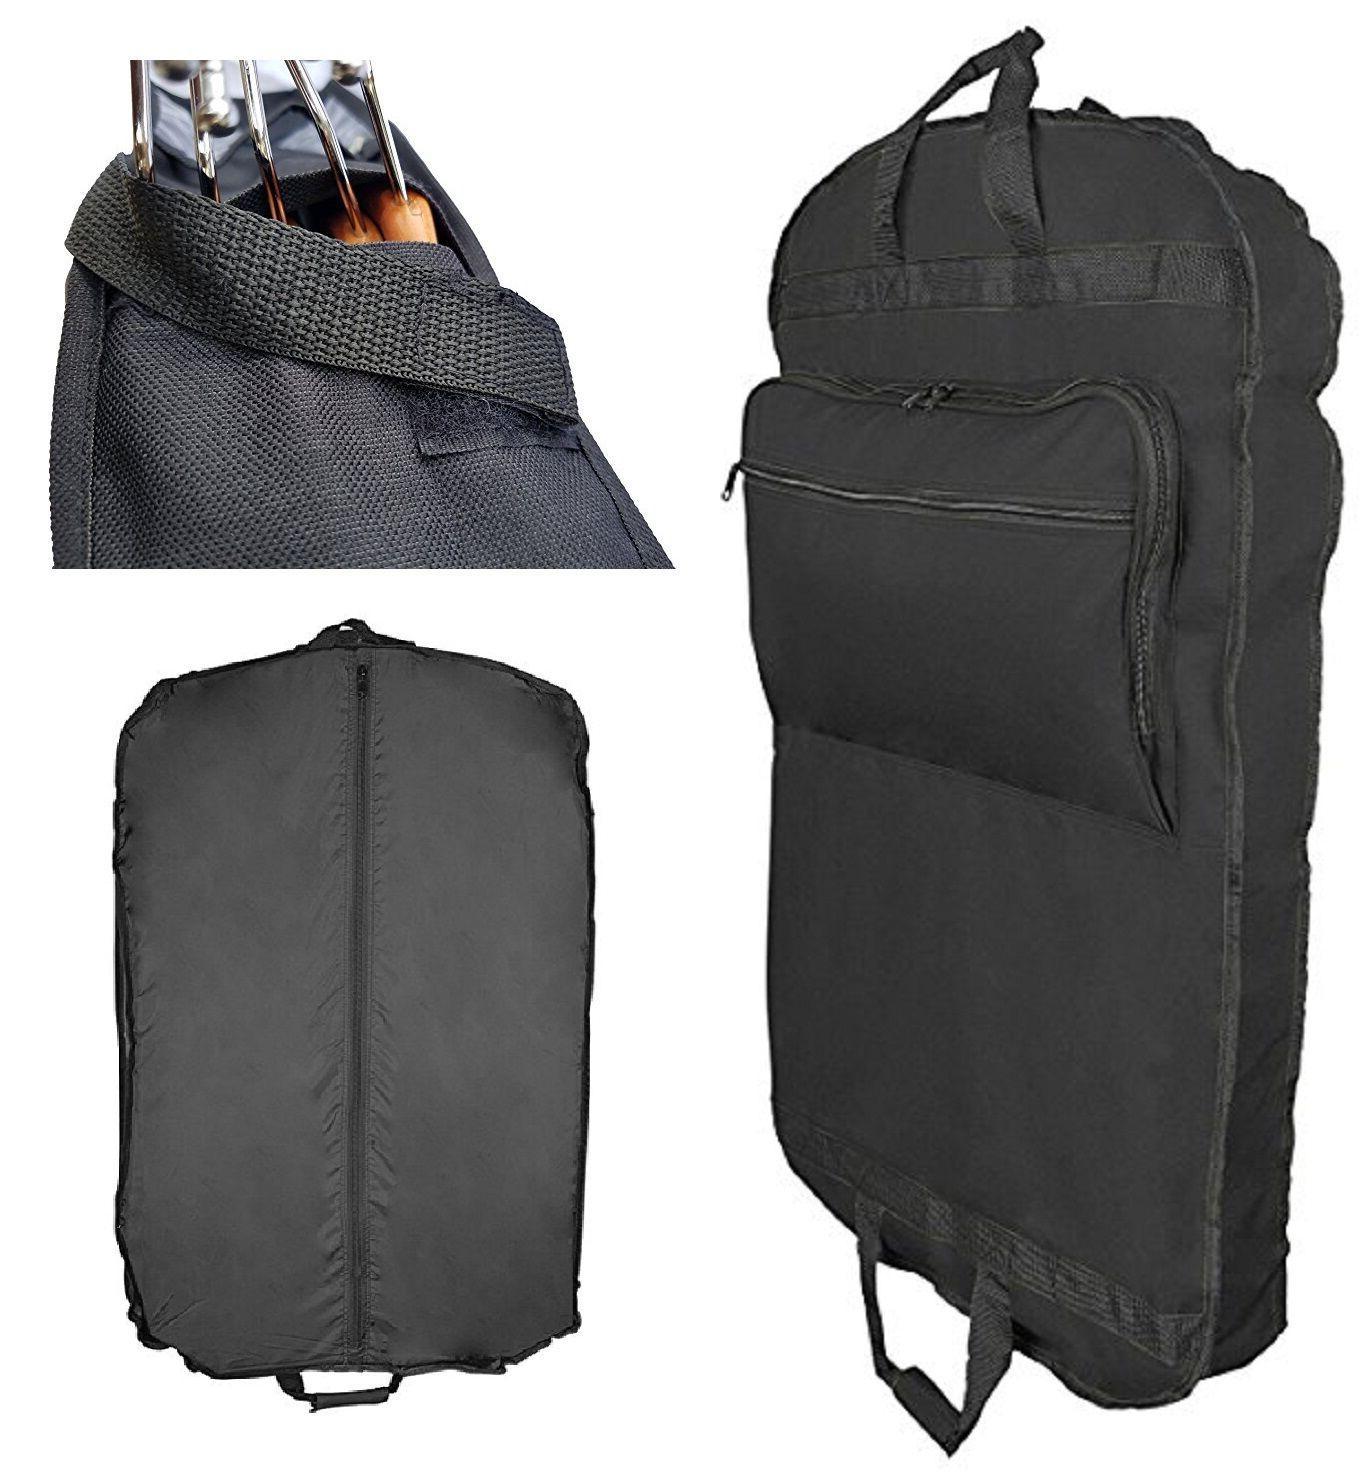 Deluxe Garment Bag 39x24 Storage